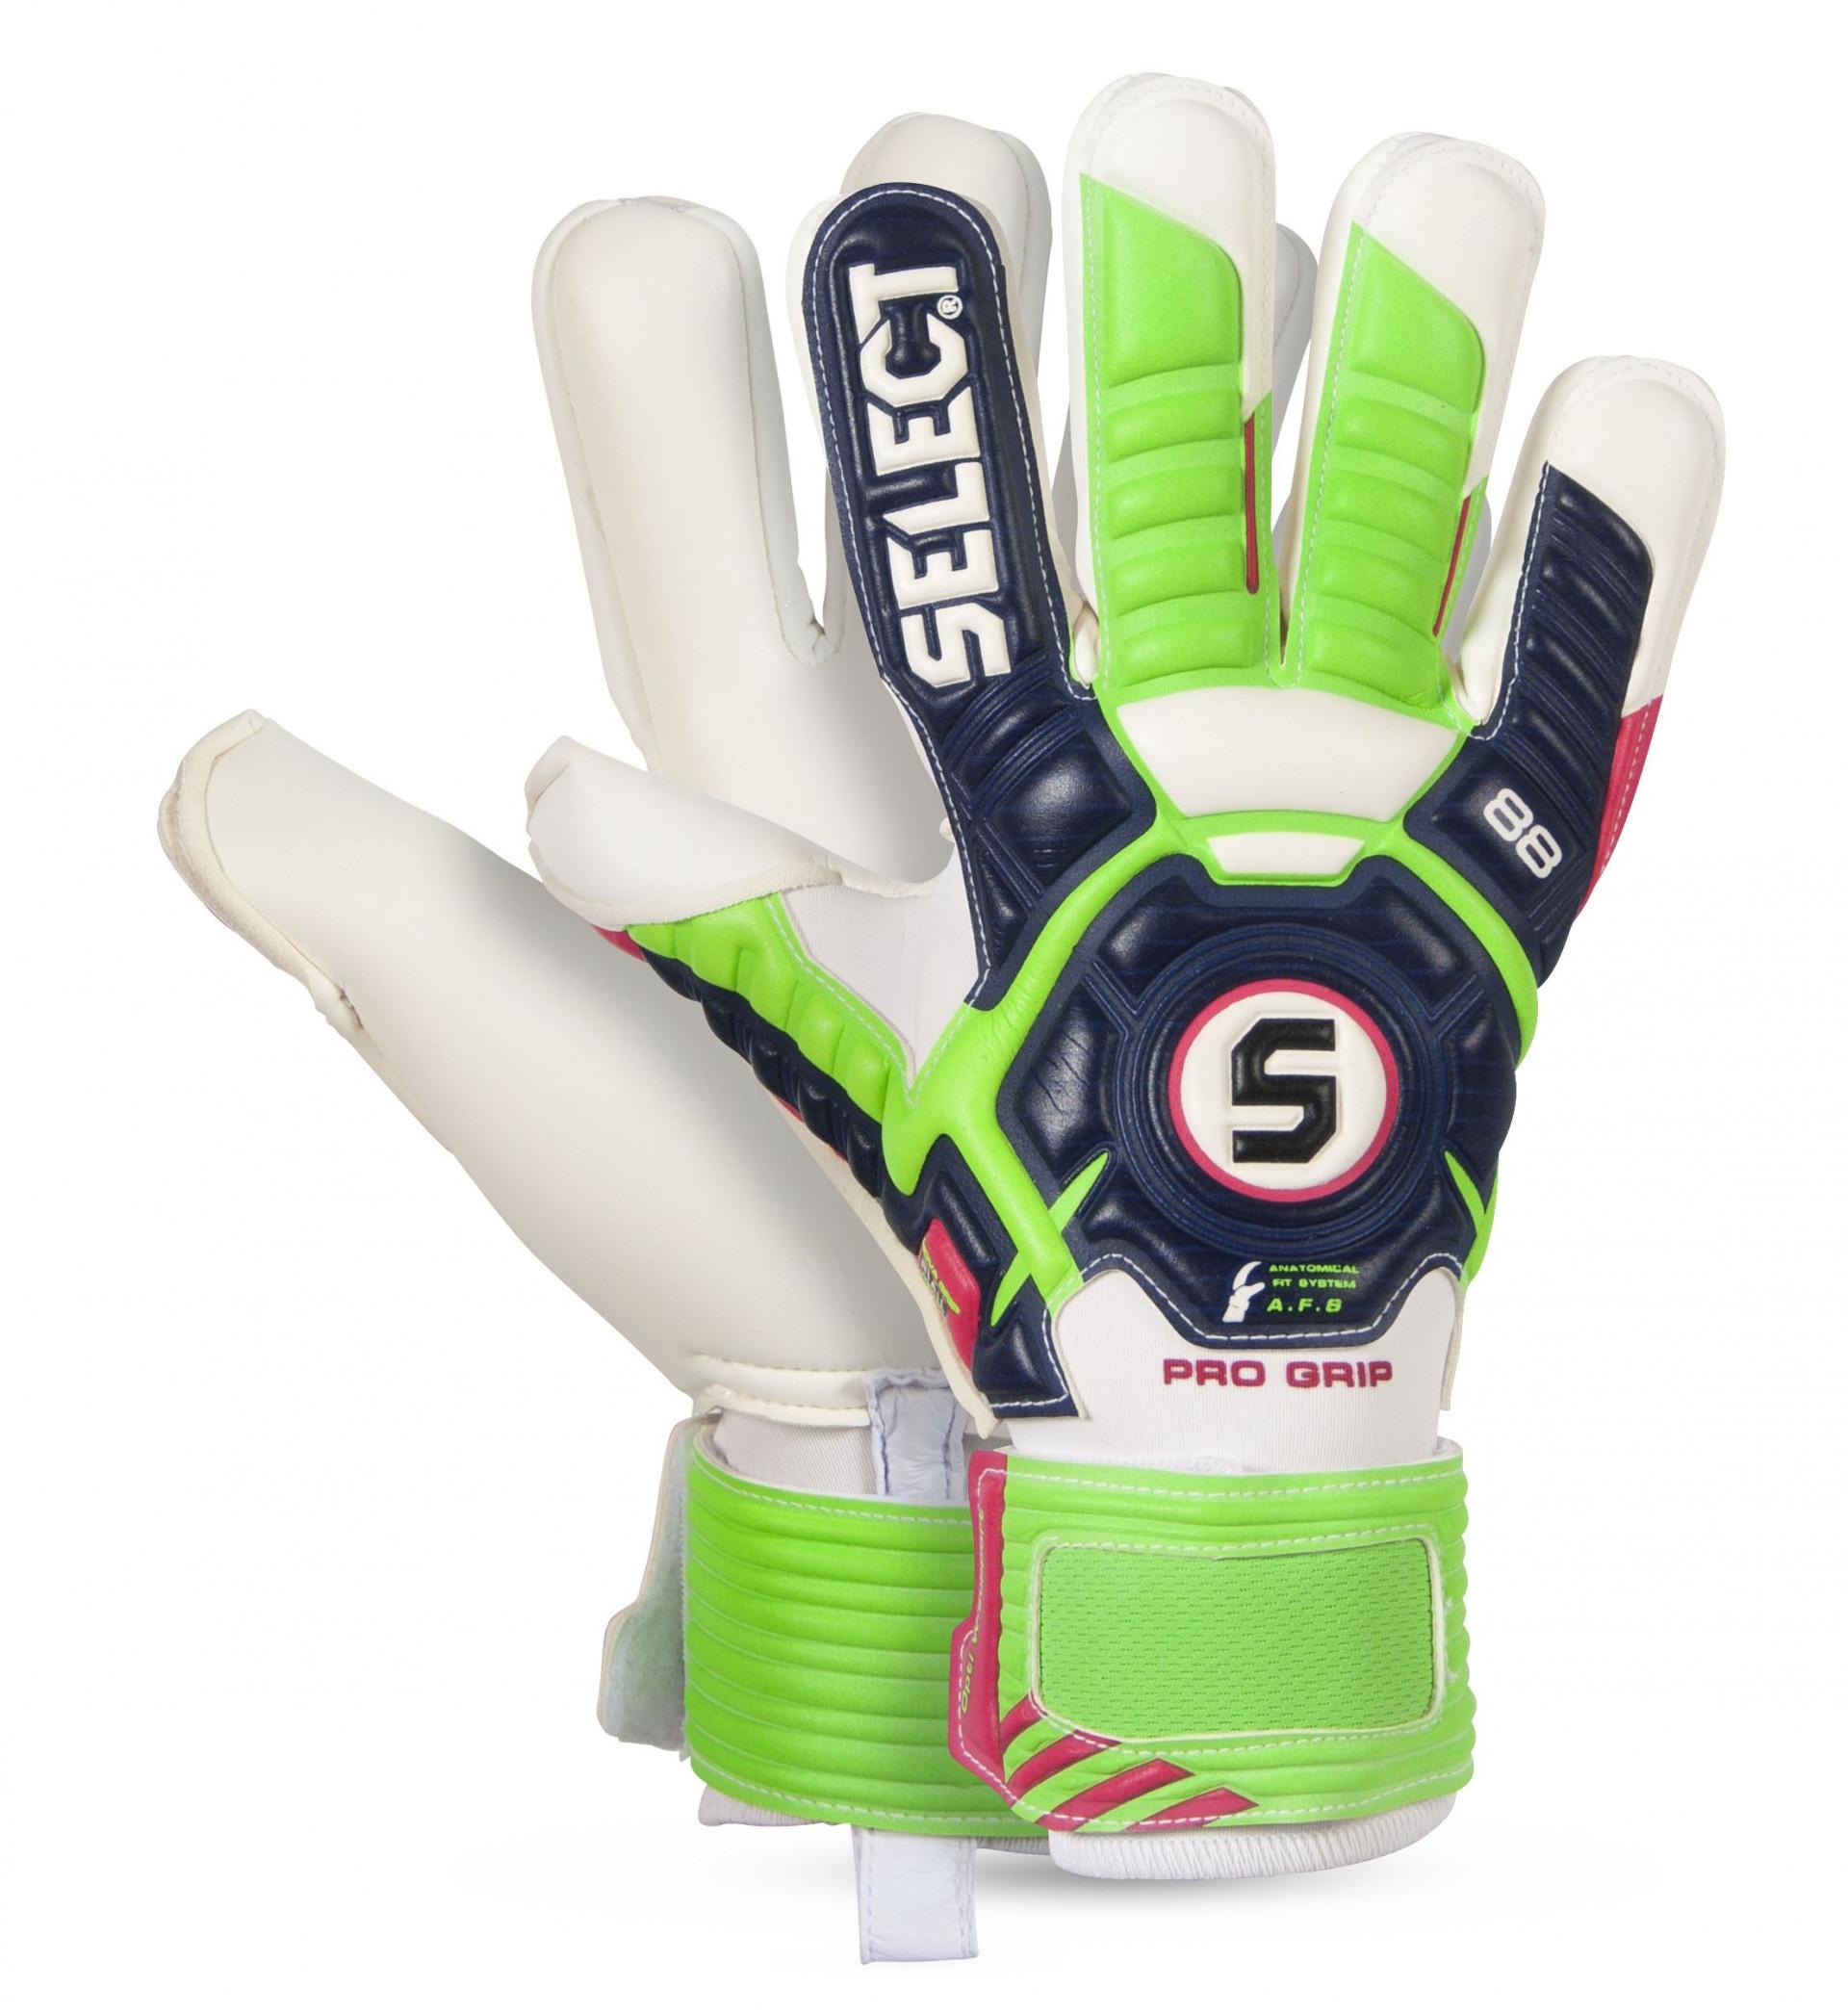 Ventes priv es gants de gardien 88 pro grip ventes priv es - Sport ventes privees ...